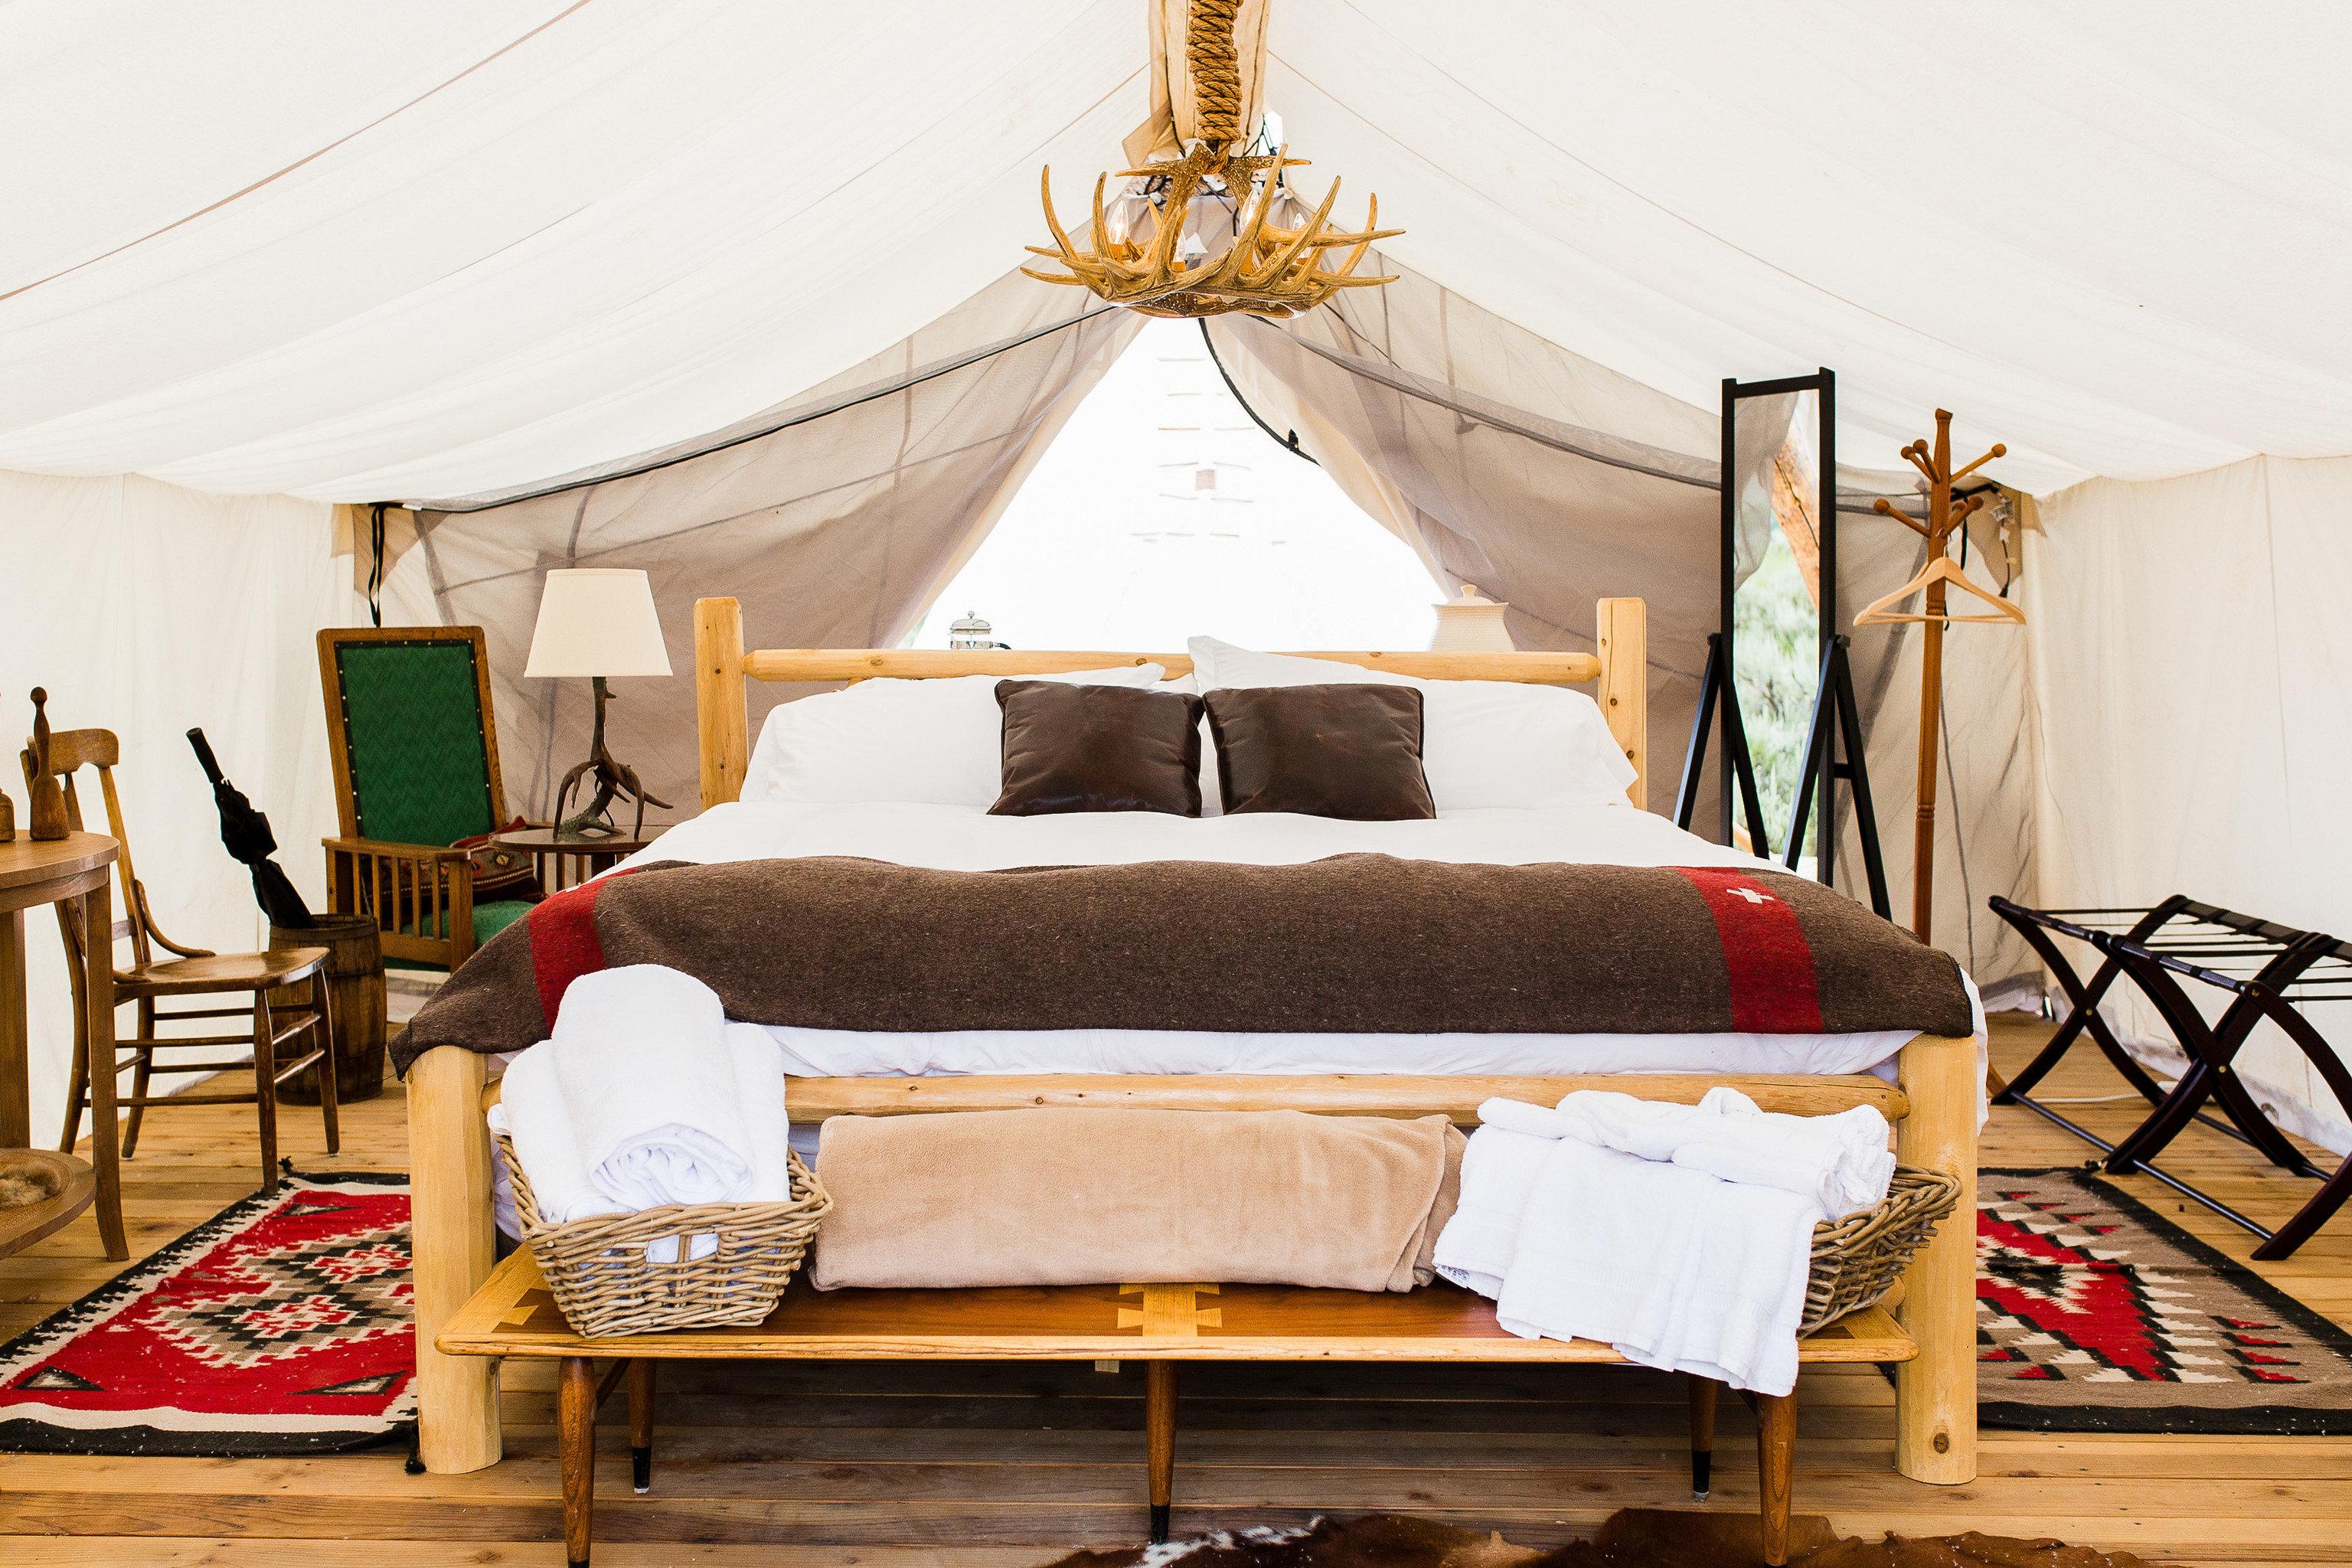 Glamping Luxury Travel Trip Ideas indoor floor furniture room bed frame bed interior design Bedroom Suite ceiling product mattress